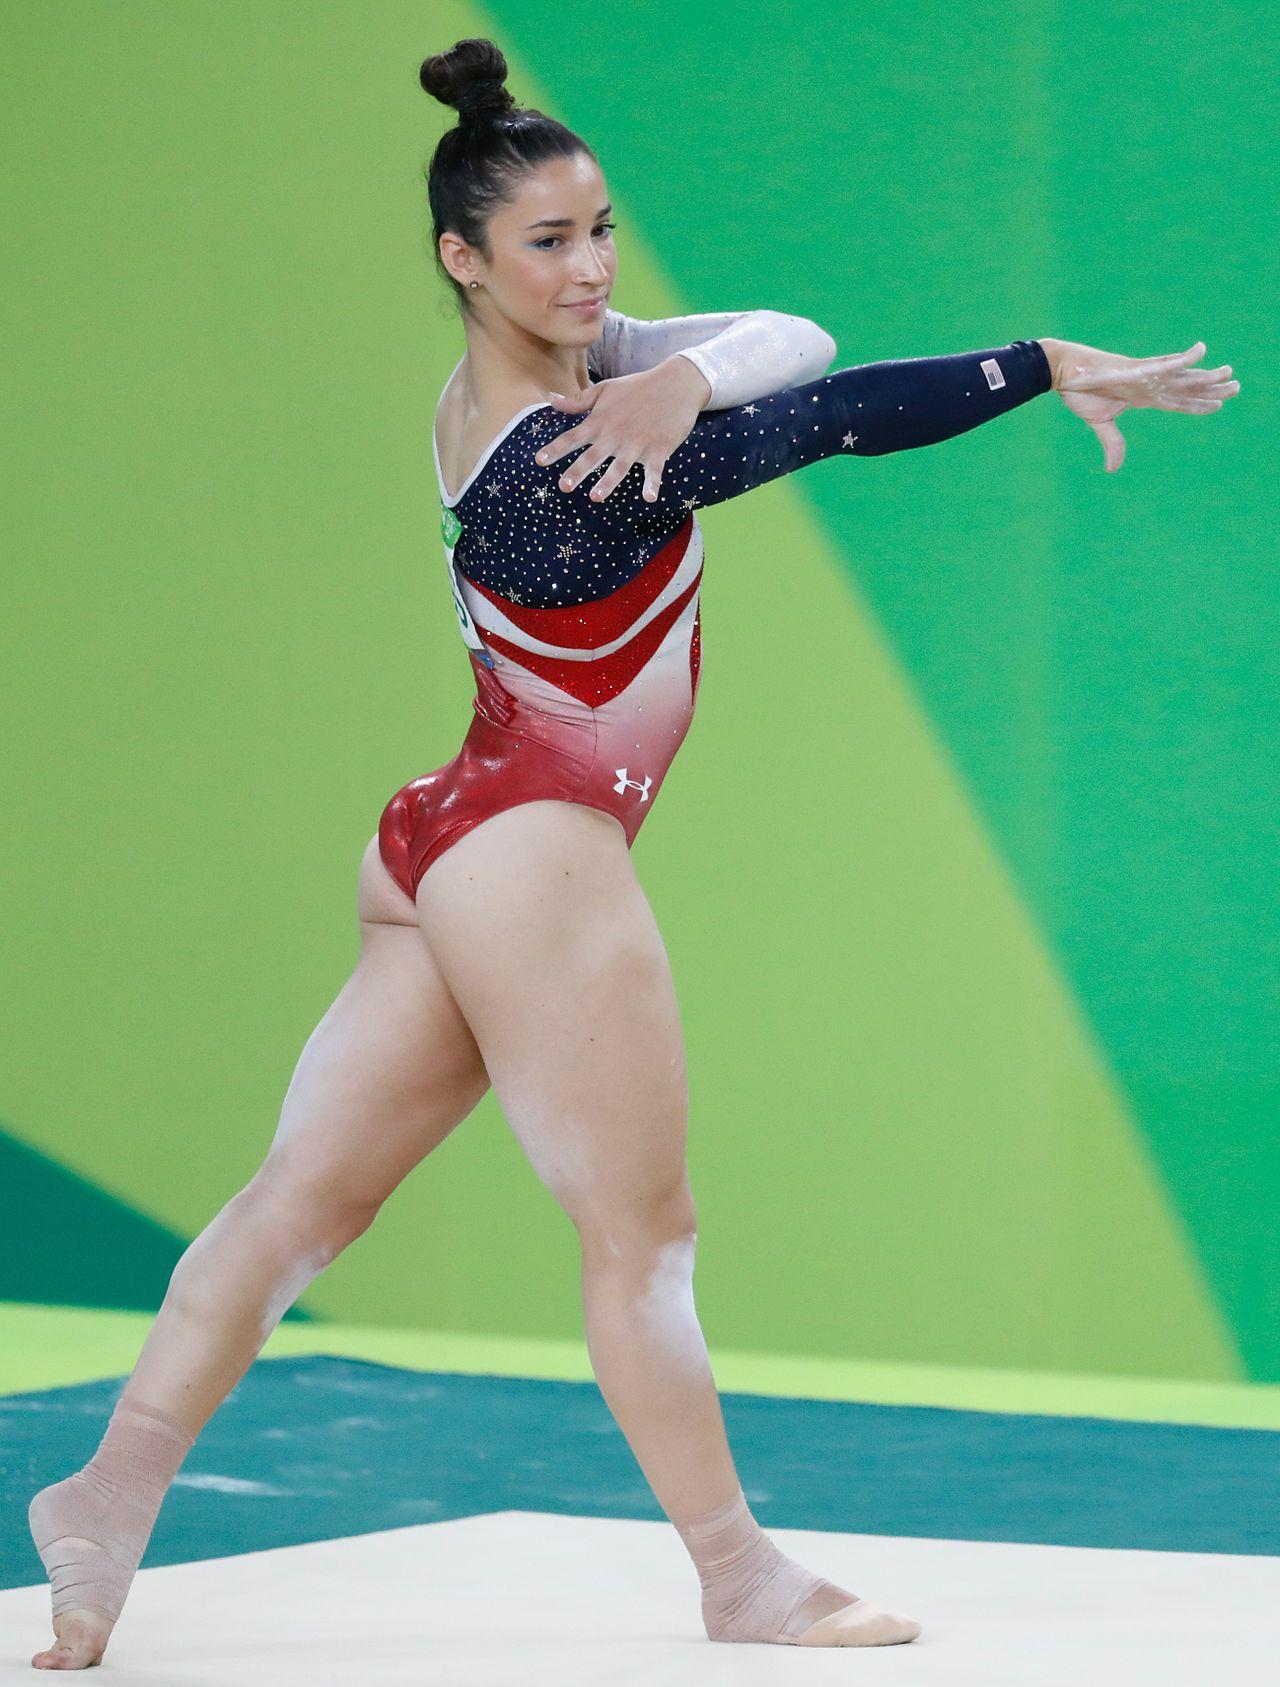 Aly Raisman - USA Leotard 2016 Rio Olympics